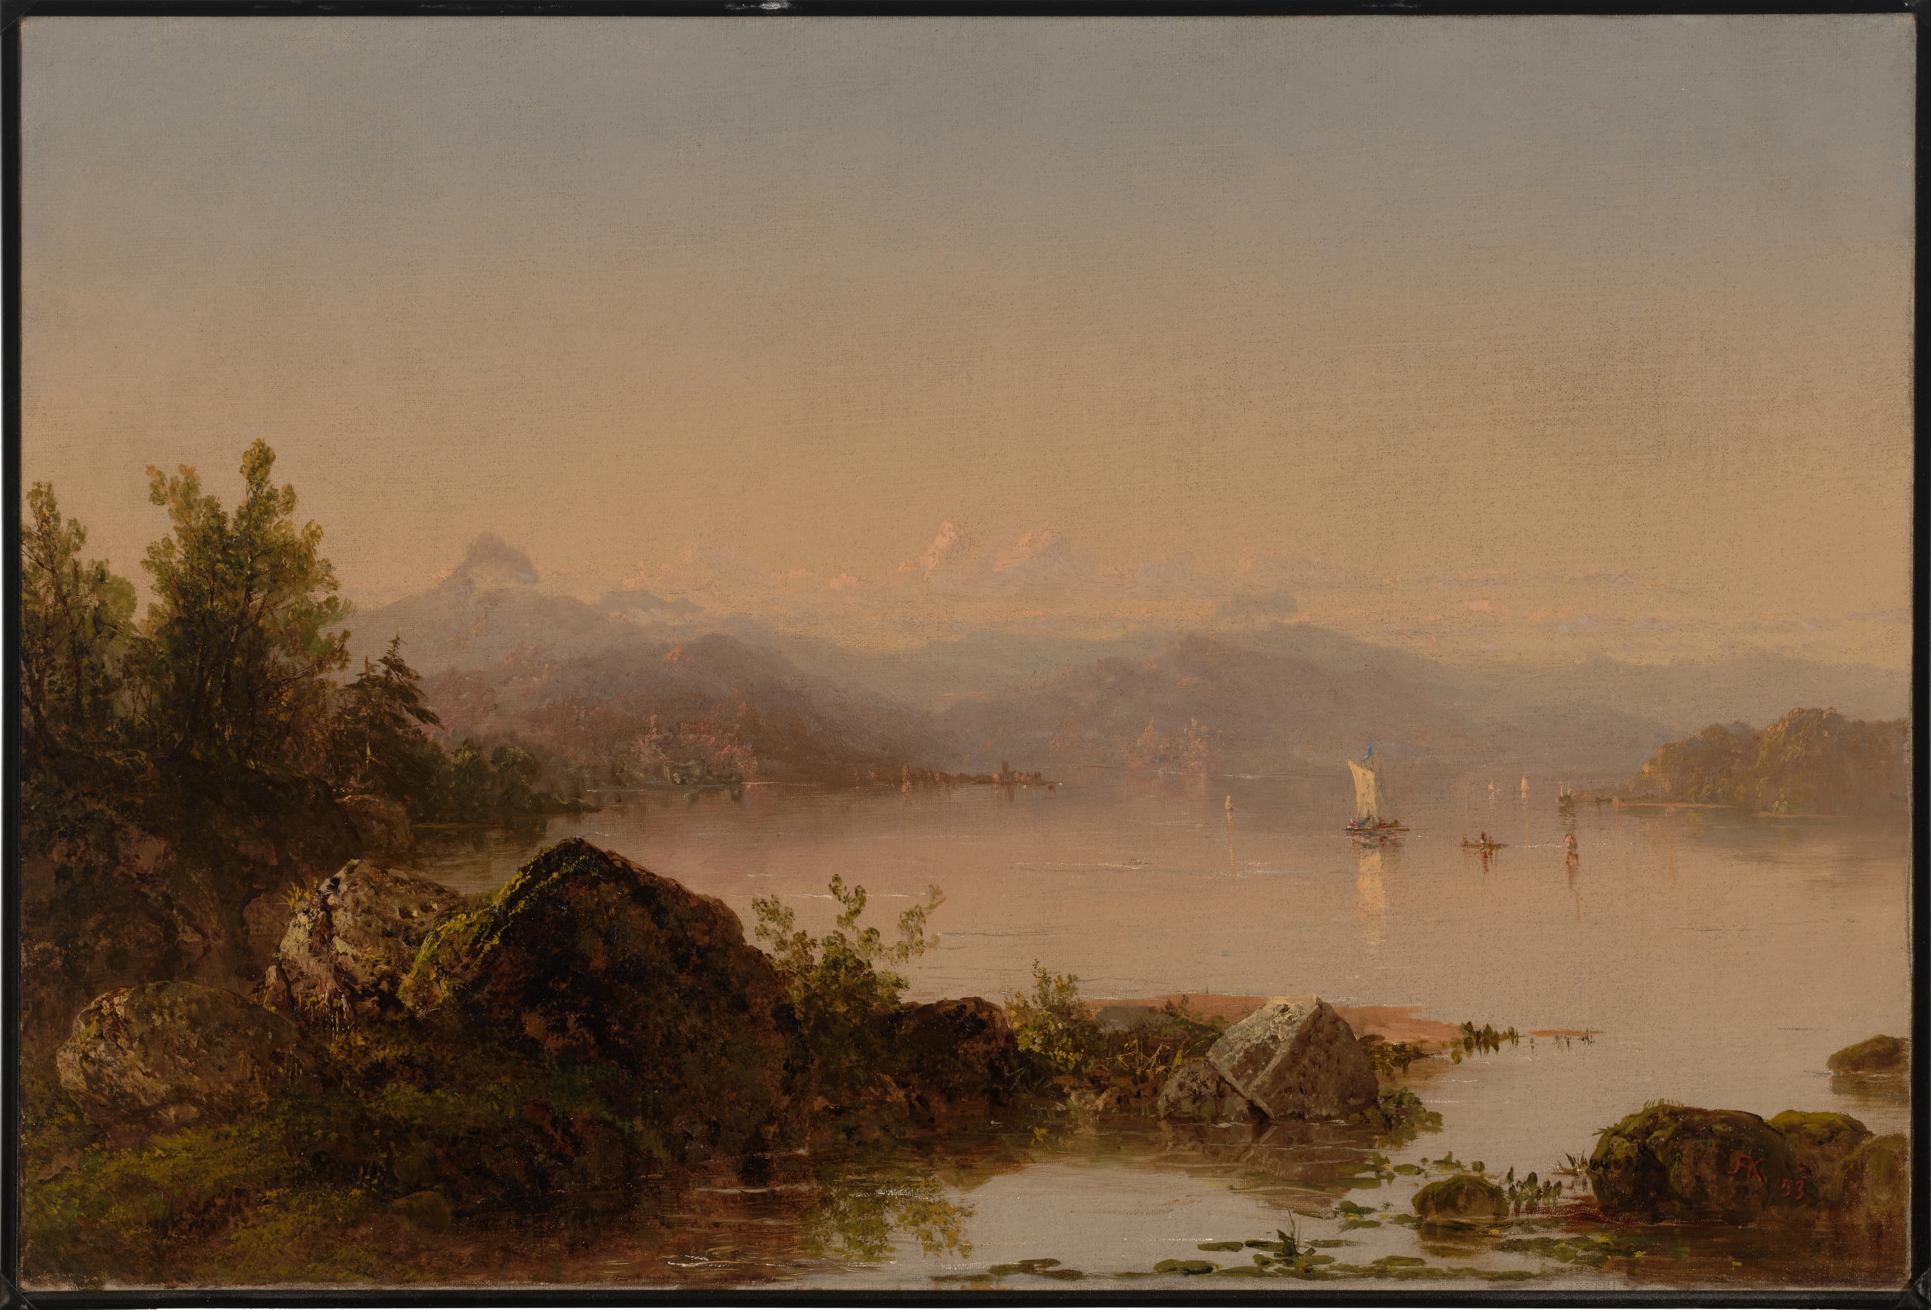 John Frederick Kensett, (American, 1816–1872), Lake George, 1853, oil on canvas. Gift of Mrs. John W. Field in memory of her husband.